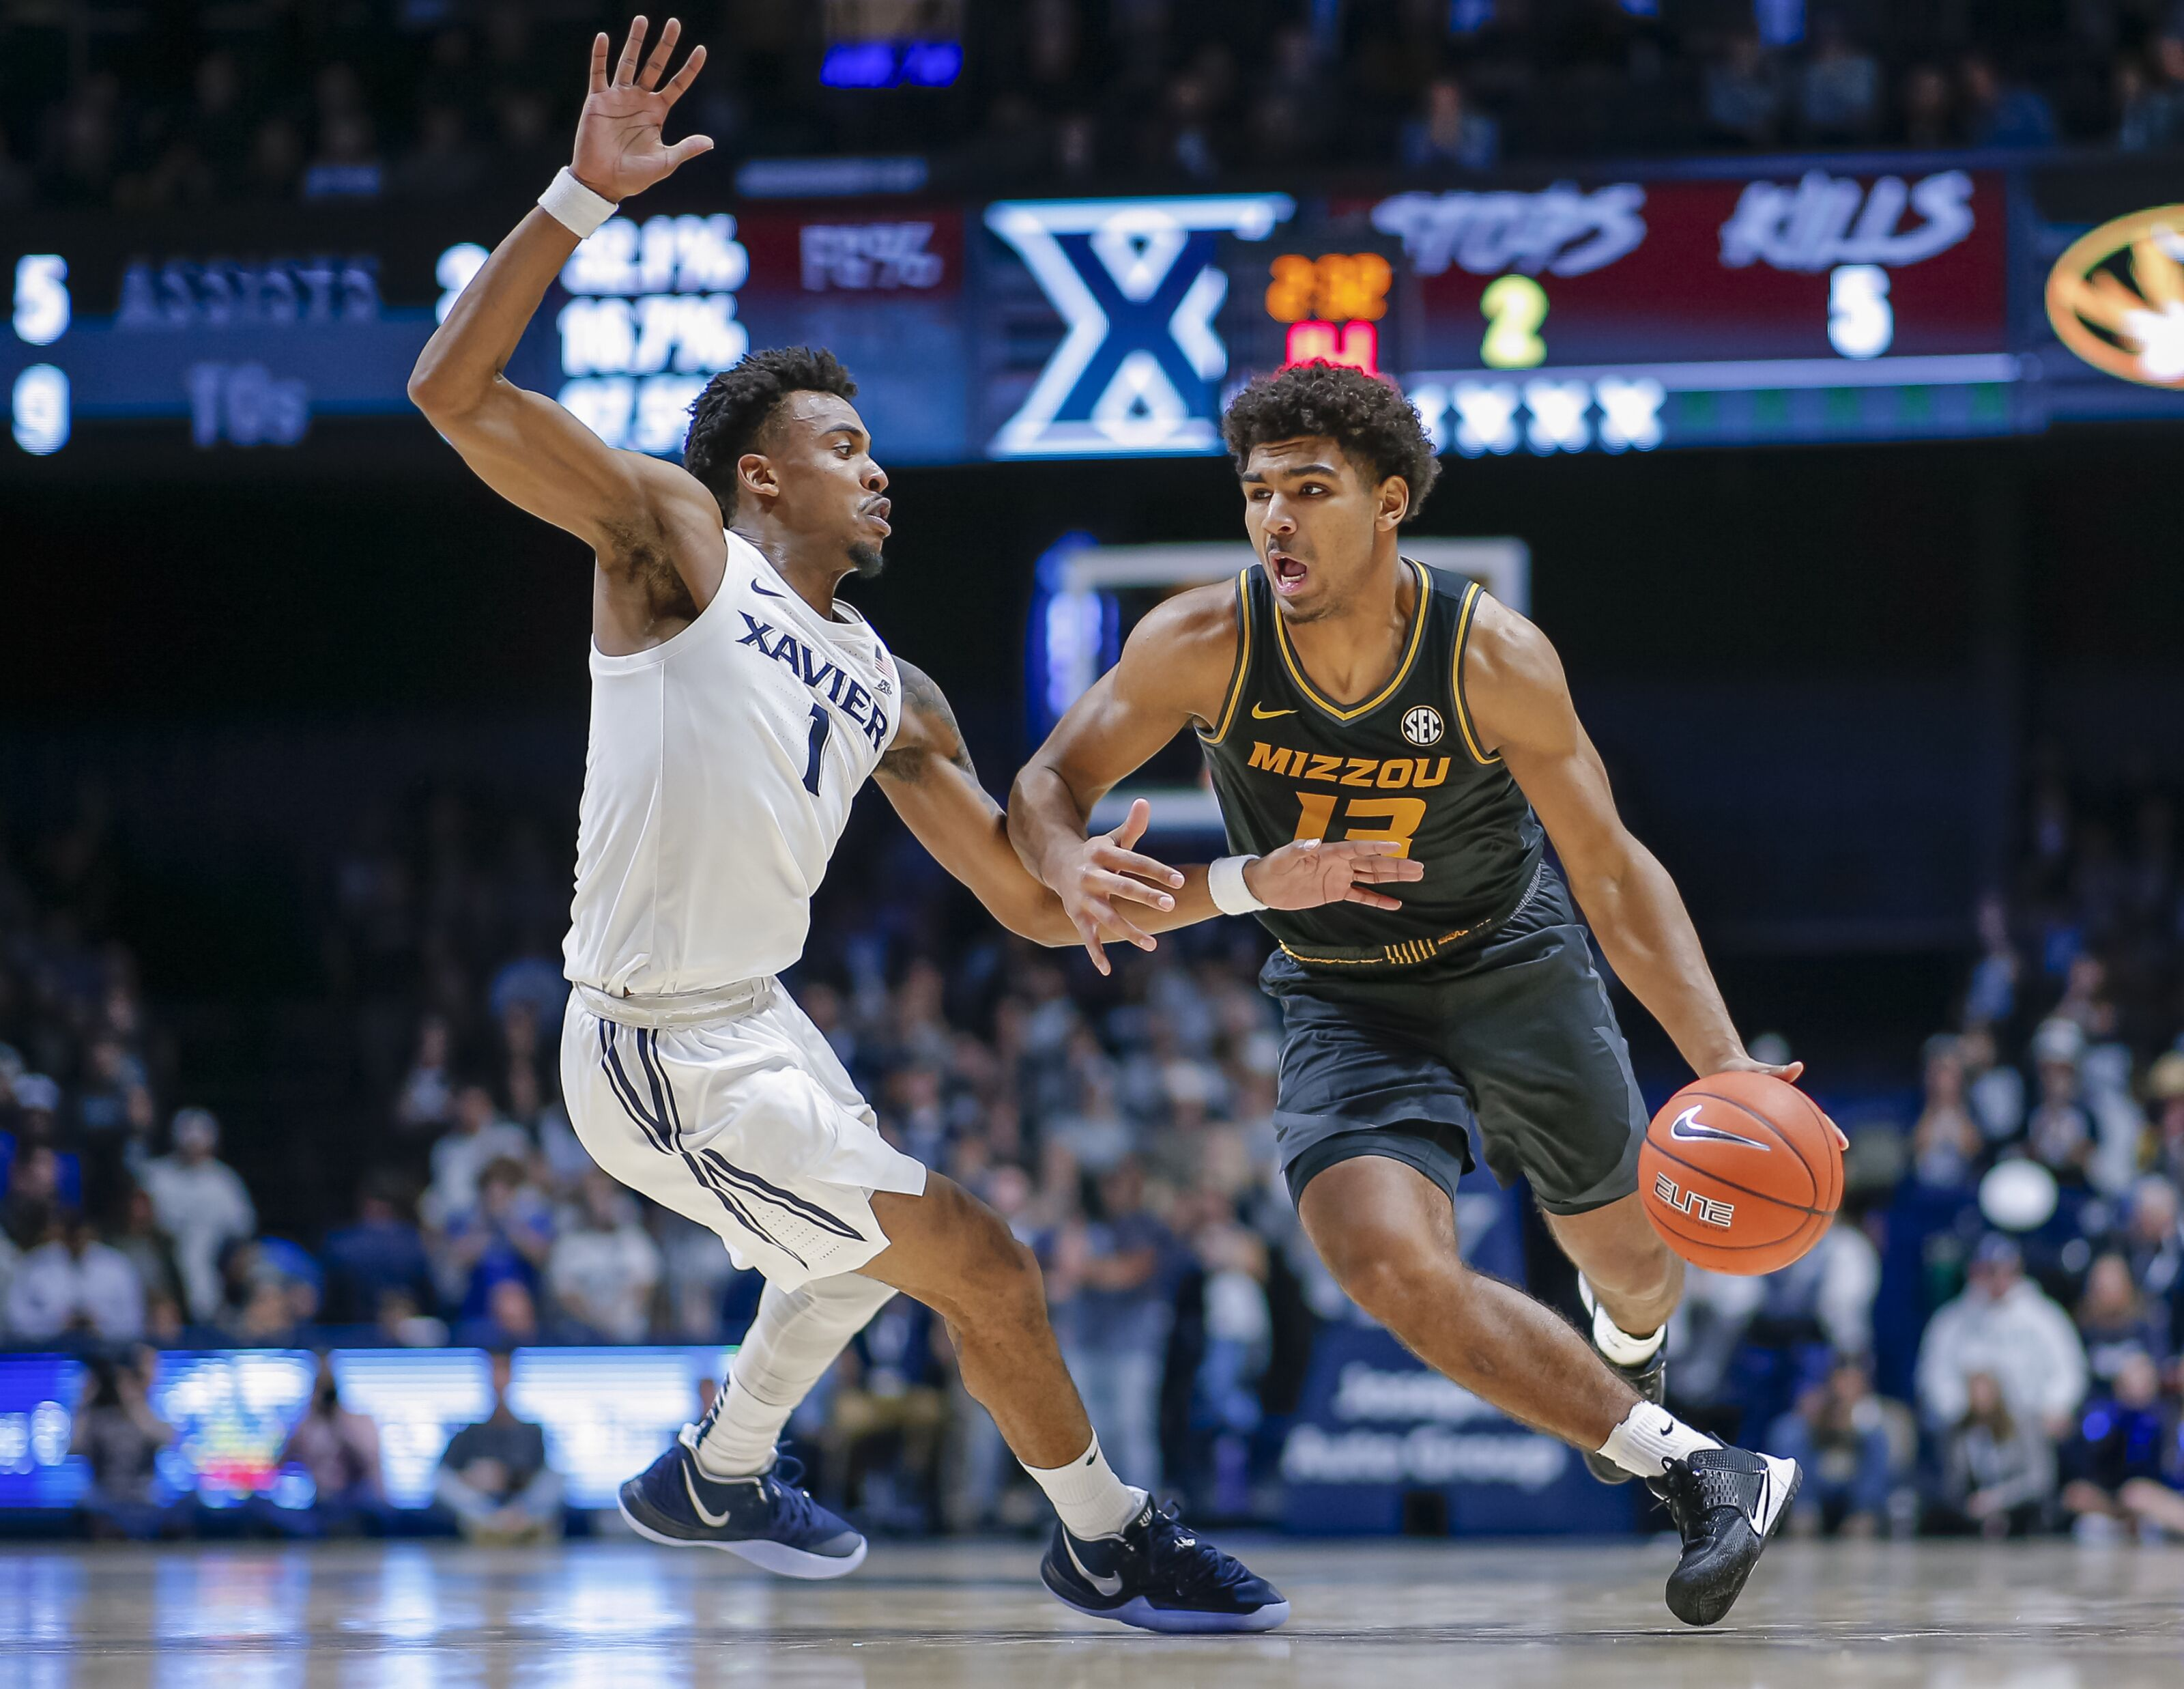 Missouri basketball returns home to play Charleston Southern